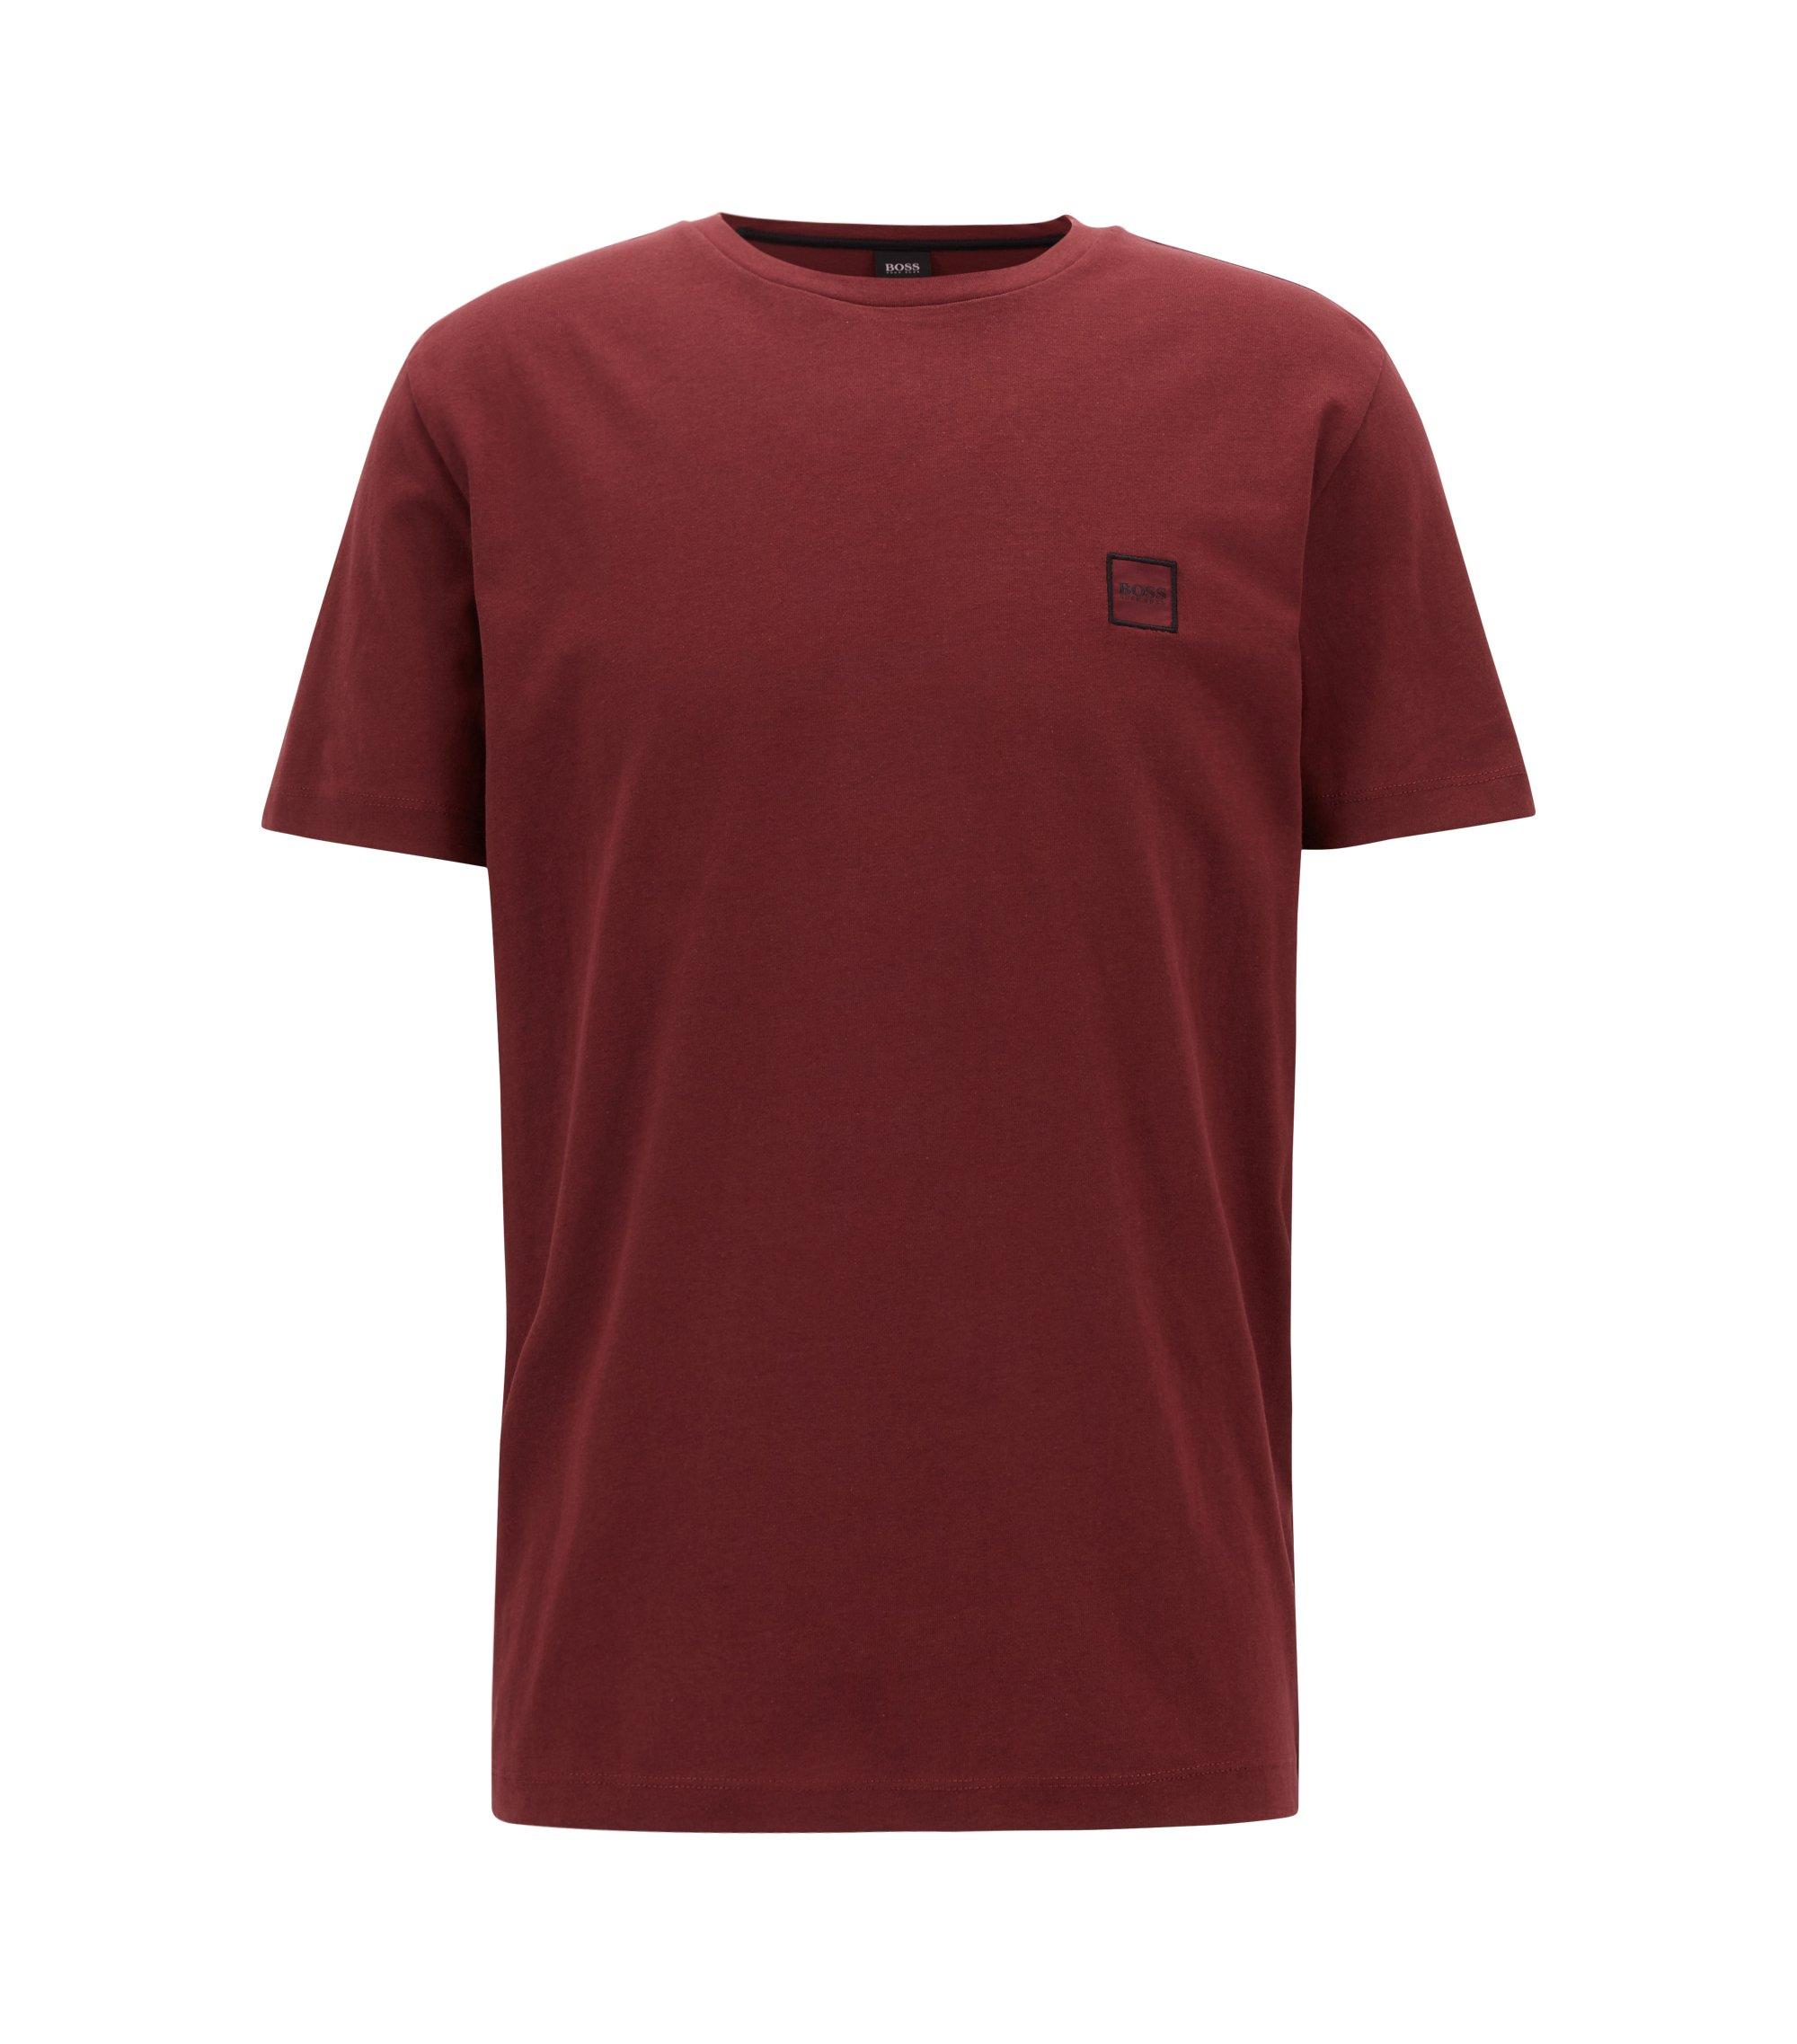 T-Shirt aus Baumwoll-Jersey mit Rundhalsausschnitt, Dunkelrot